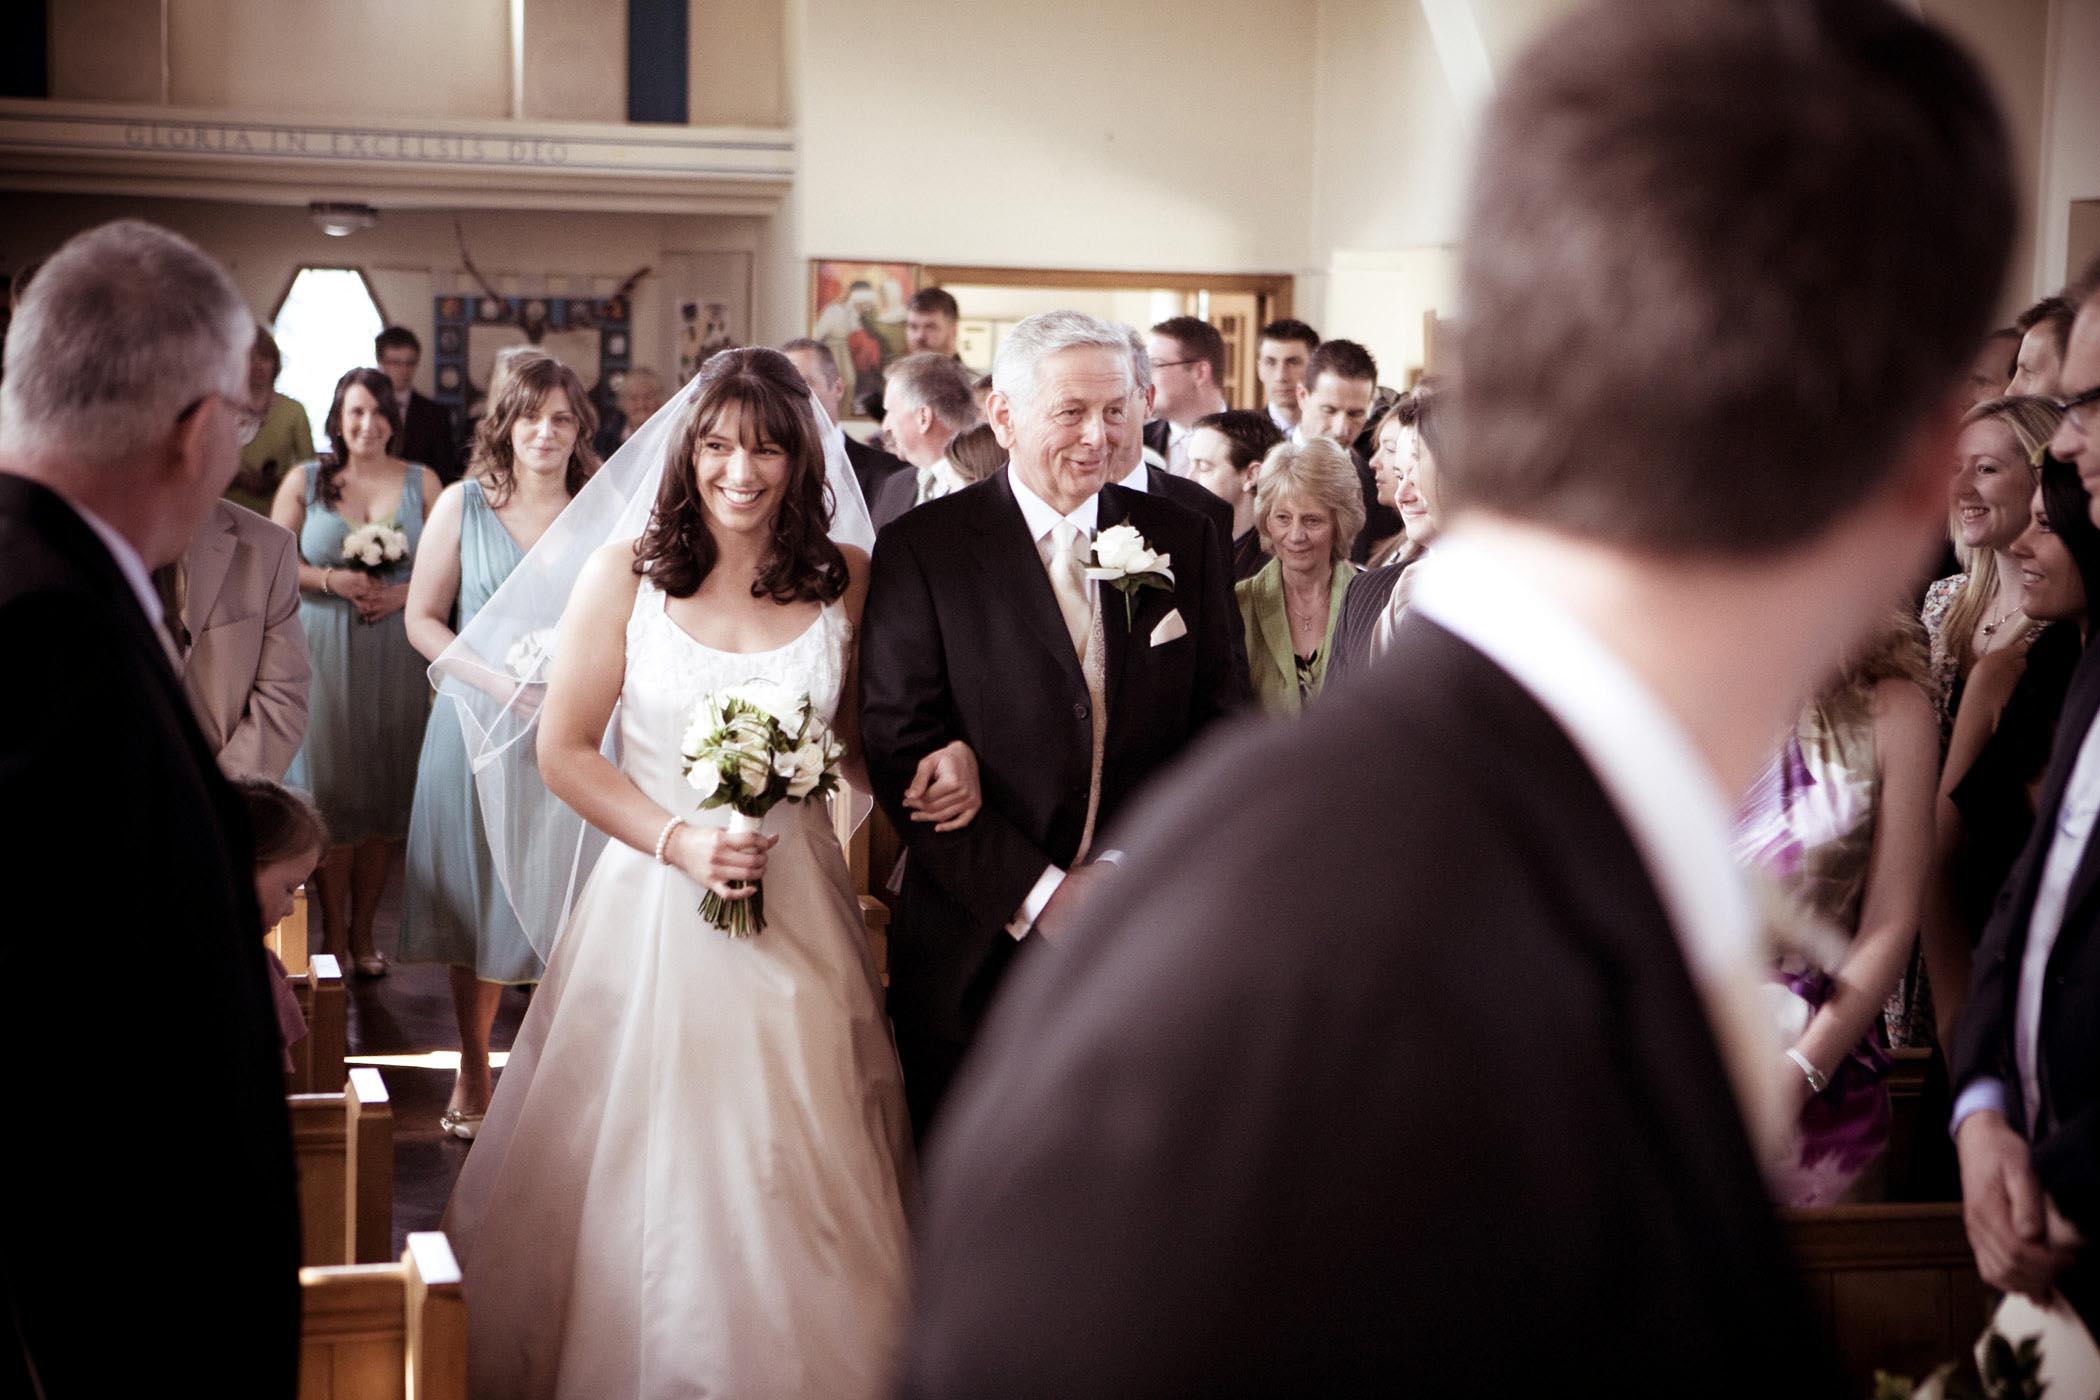 dan_burman_wedding_photography (27).jpg